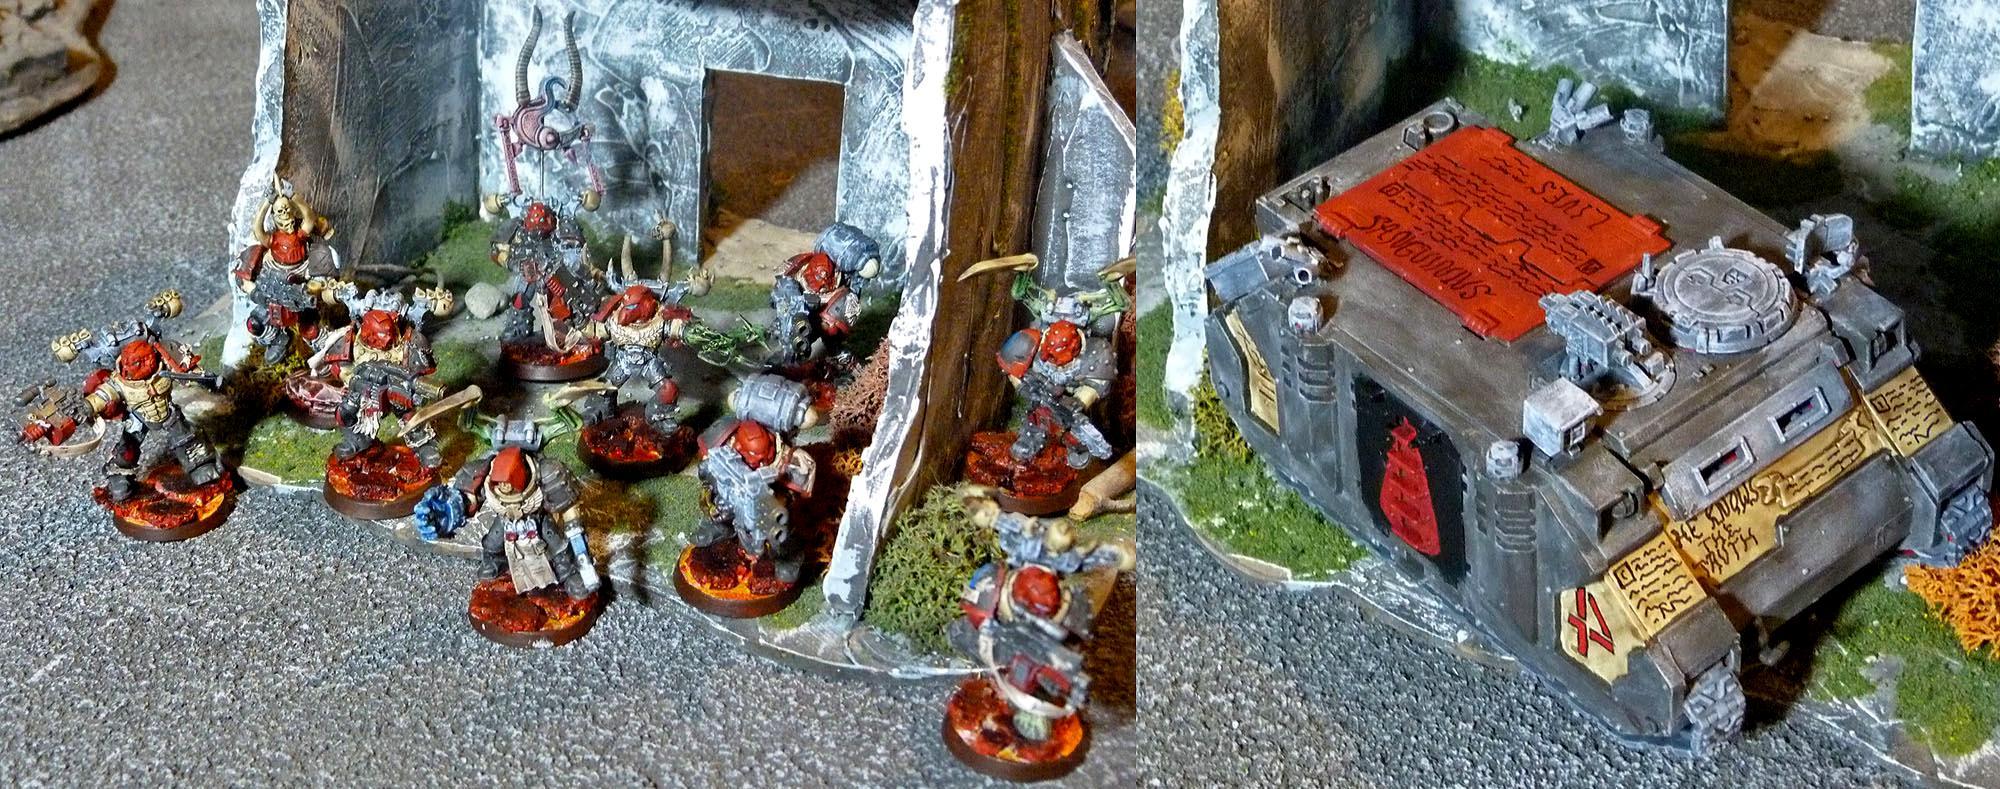 Warhammer 40,000, Renegades 4th Squad